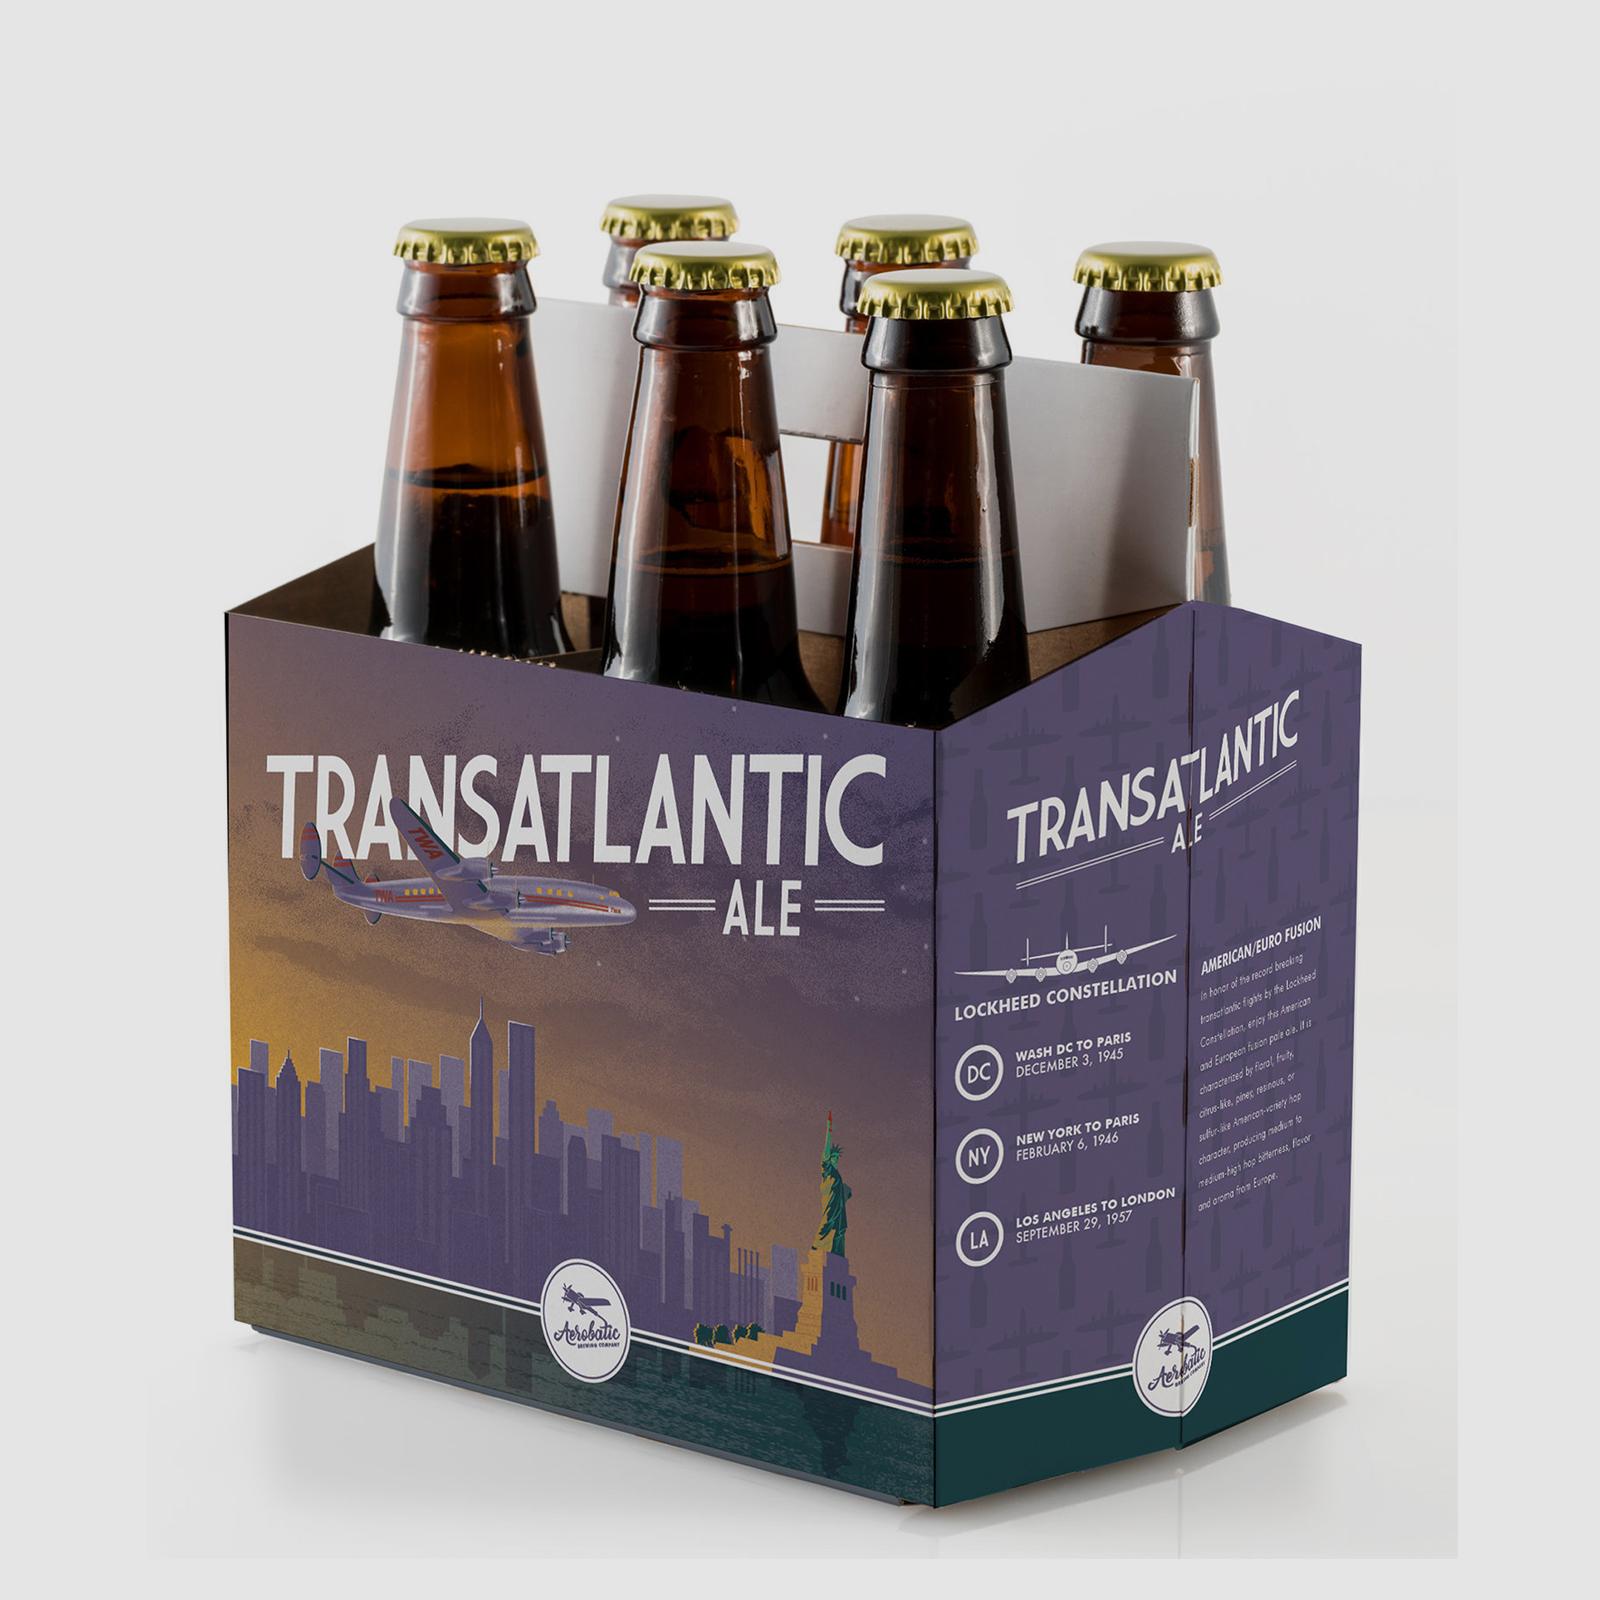 Transatlantic Ale